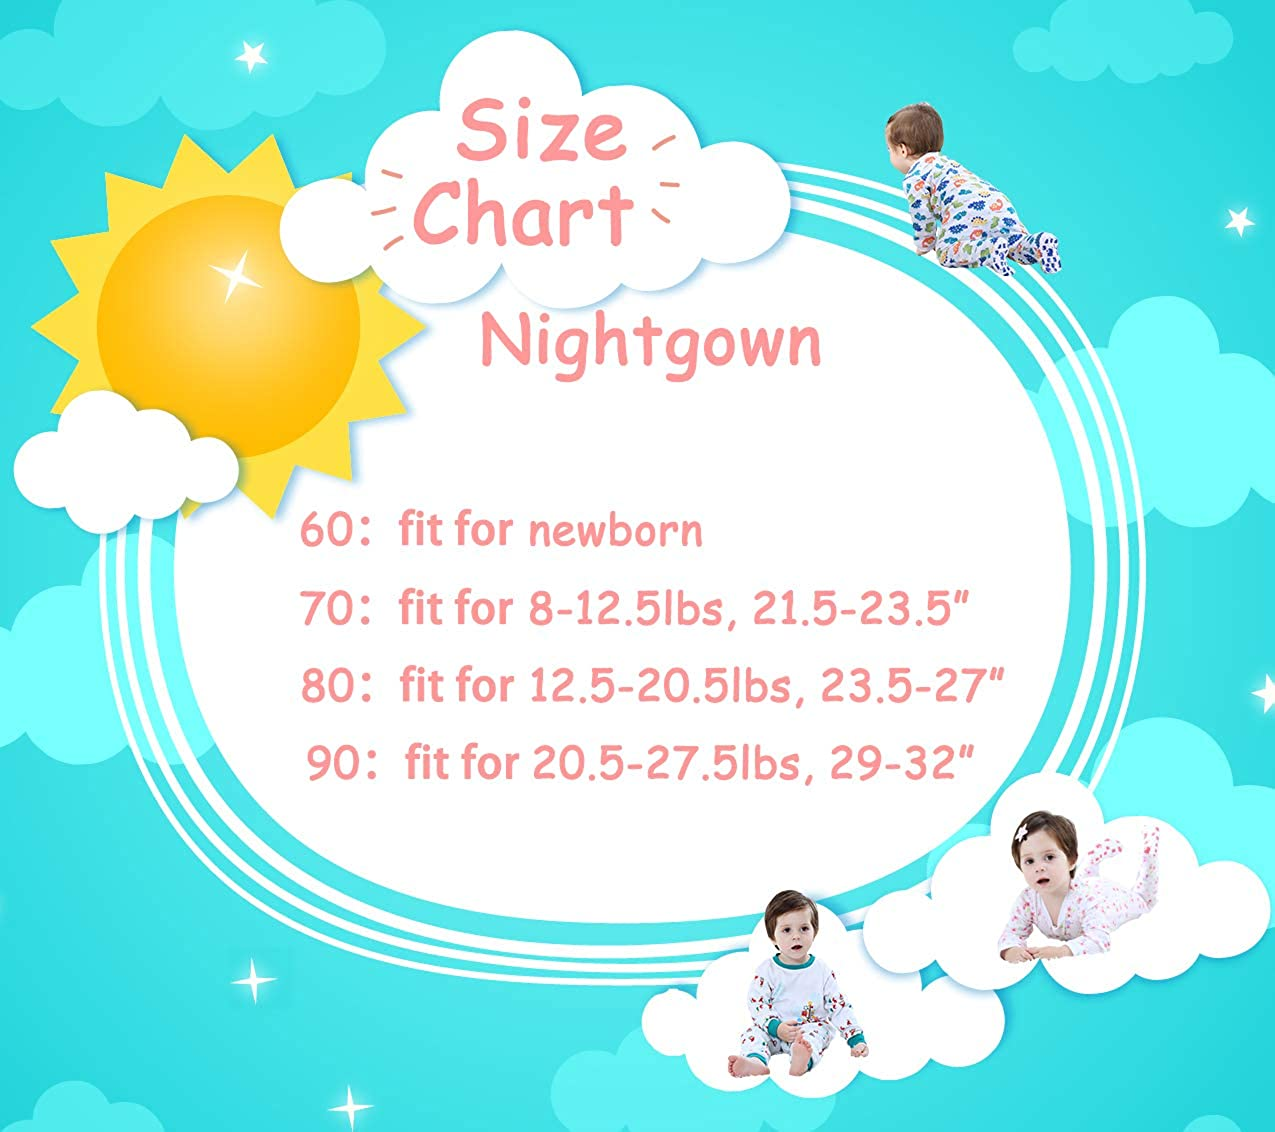 Marquebaby Baby Sleep Gown Organic Cotton Lightweight 0-18 Months Sleeper for Easier Diaper Changing with Mitten Cuffs